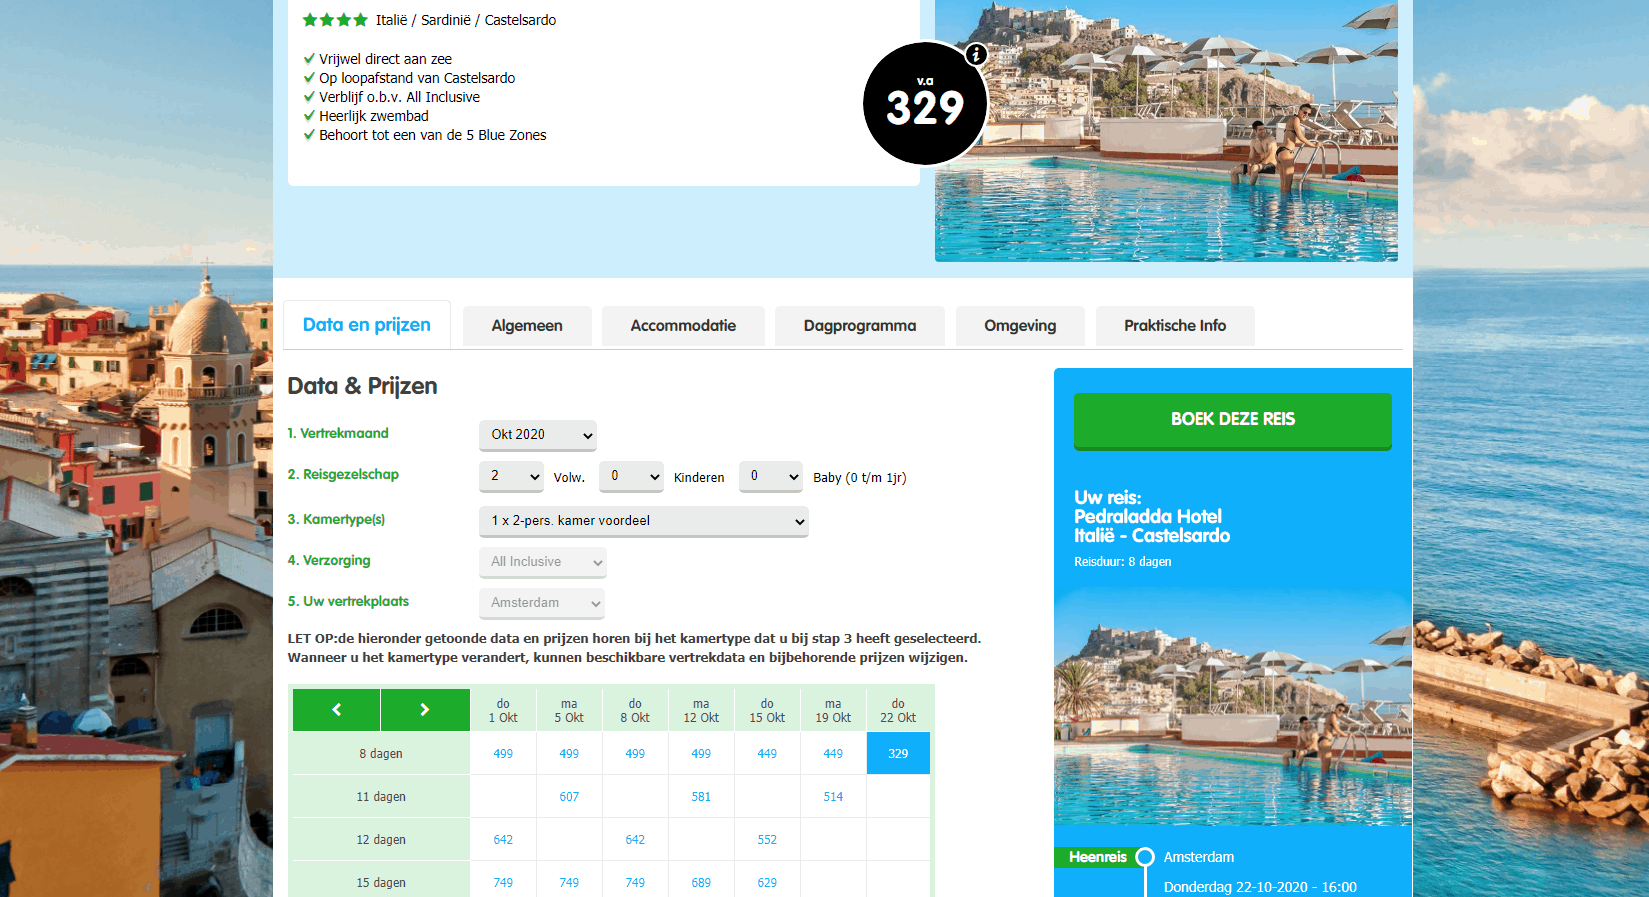 aanbiedingen goedkoopste all inclusive vliegvakanties Sardinië 2020 2 Aanbiedingen goedkope 8 daagse All Inclusive vliegvakanties Sardinië, ****Hotels, vanaf € 374.